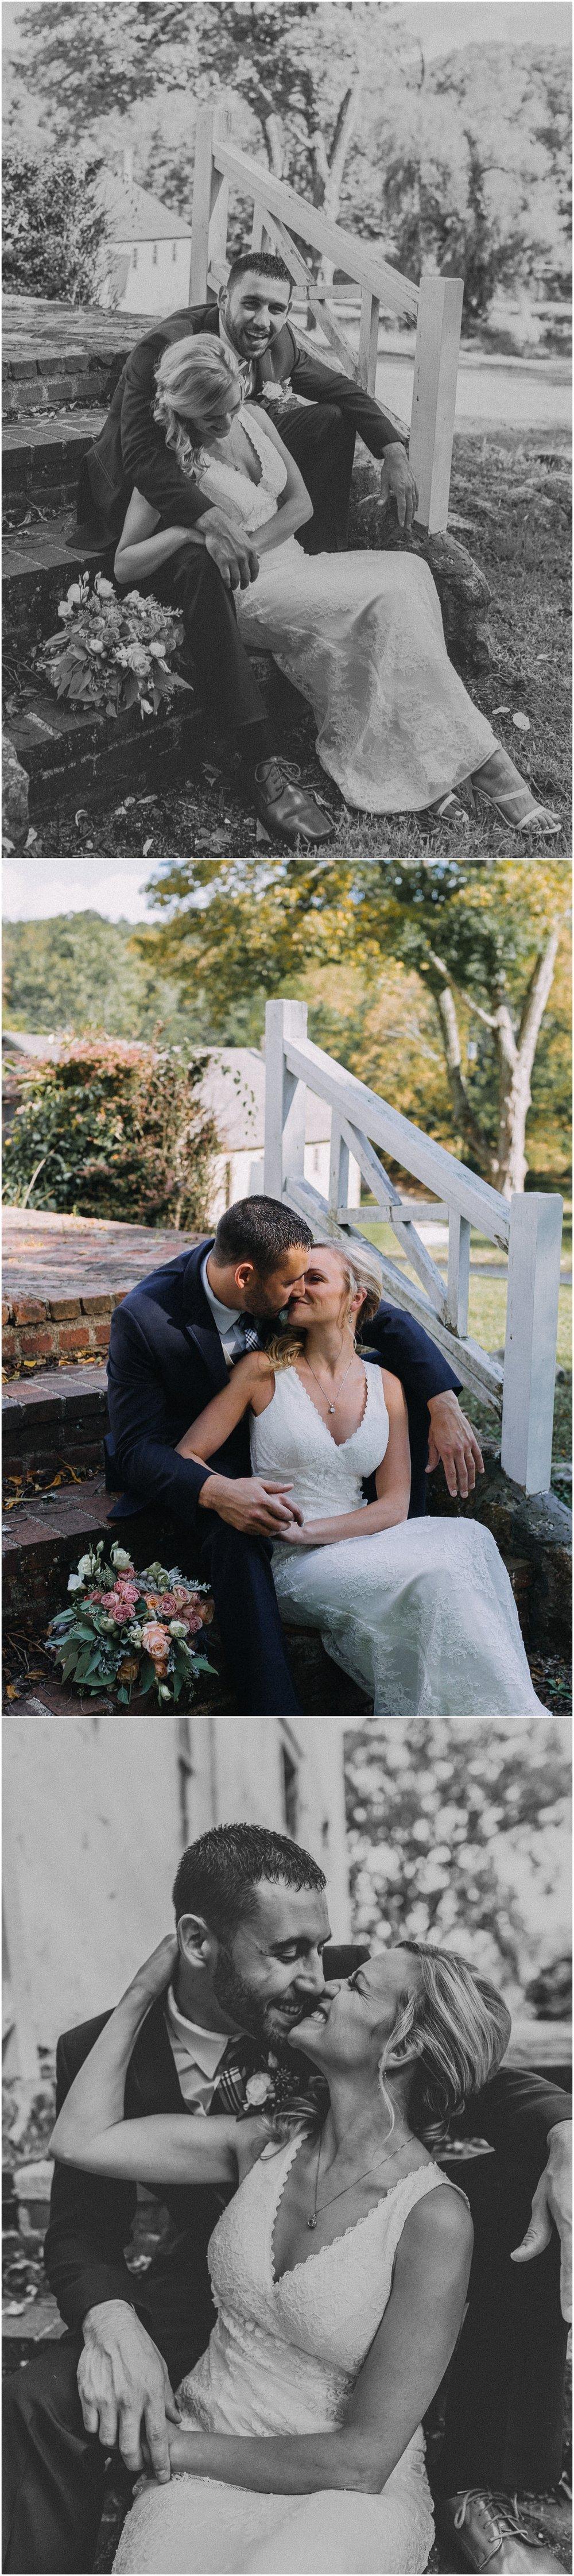 waterloo-village-waterloo village-wedding-outdoor wedding-rustic-boemian-new jersey-bride-groom-wedding party-davids bridal-wedding dress-wedding-first kiss-intimate wedding_0368.jpg